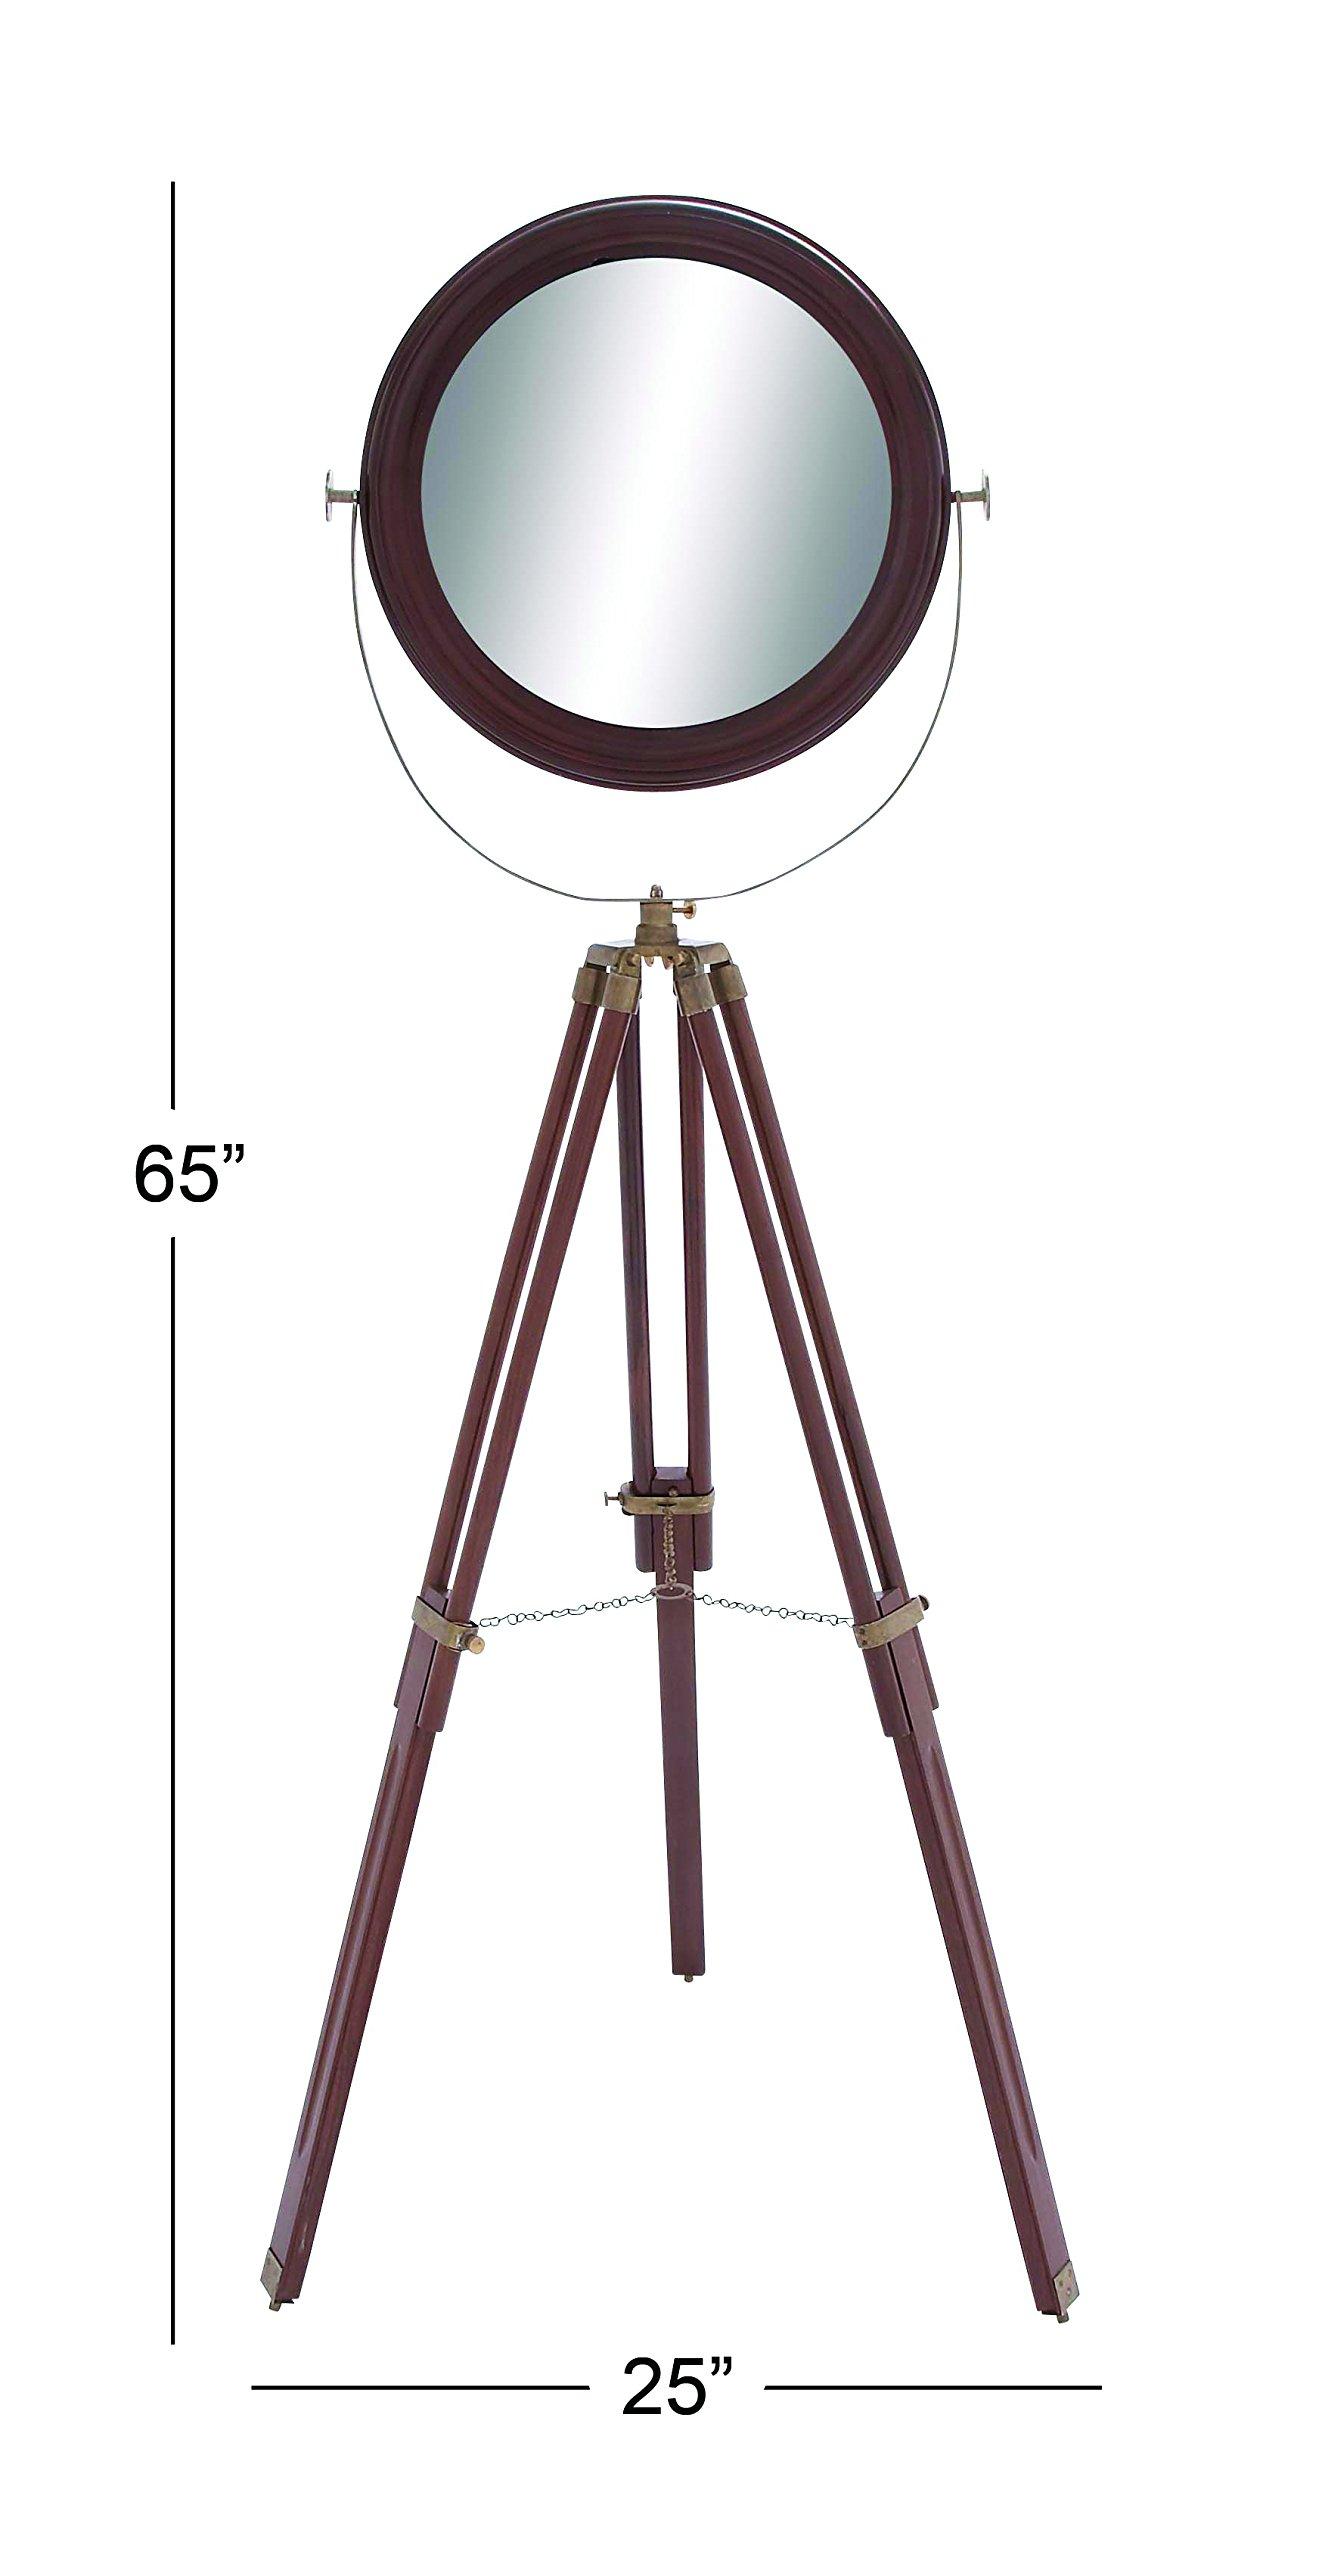 Deco 79 Wood Round Floor Mirror, 25 by 65-Inch